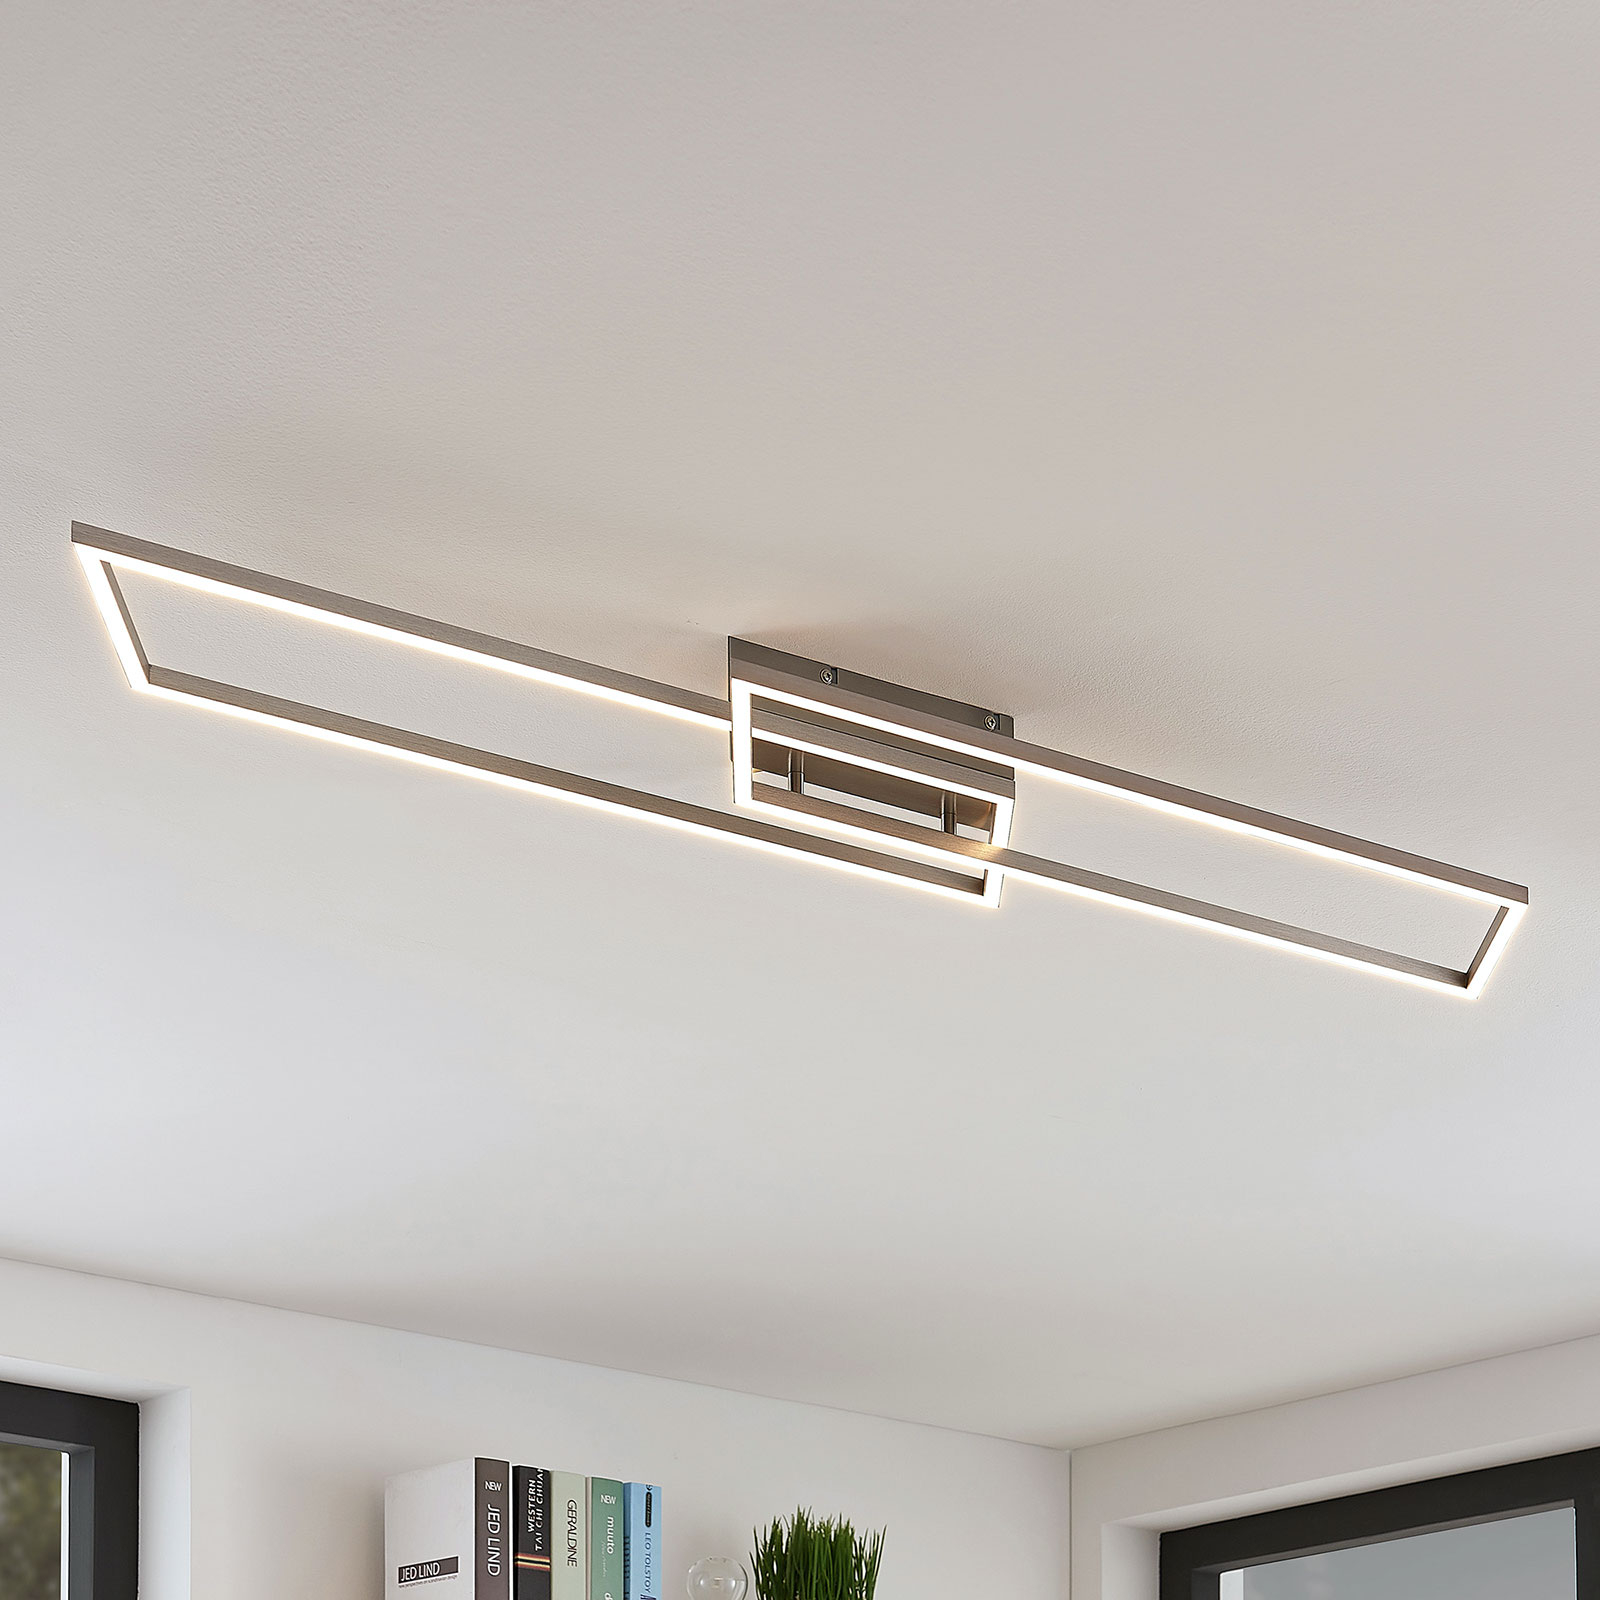 Lijnrechte LED plafondlamp Quadra, dimbaar